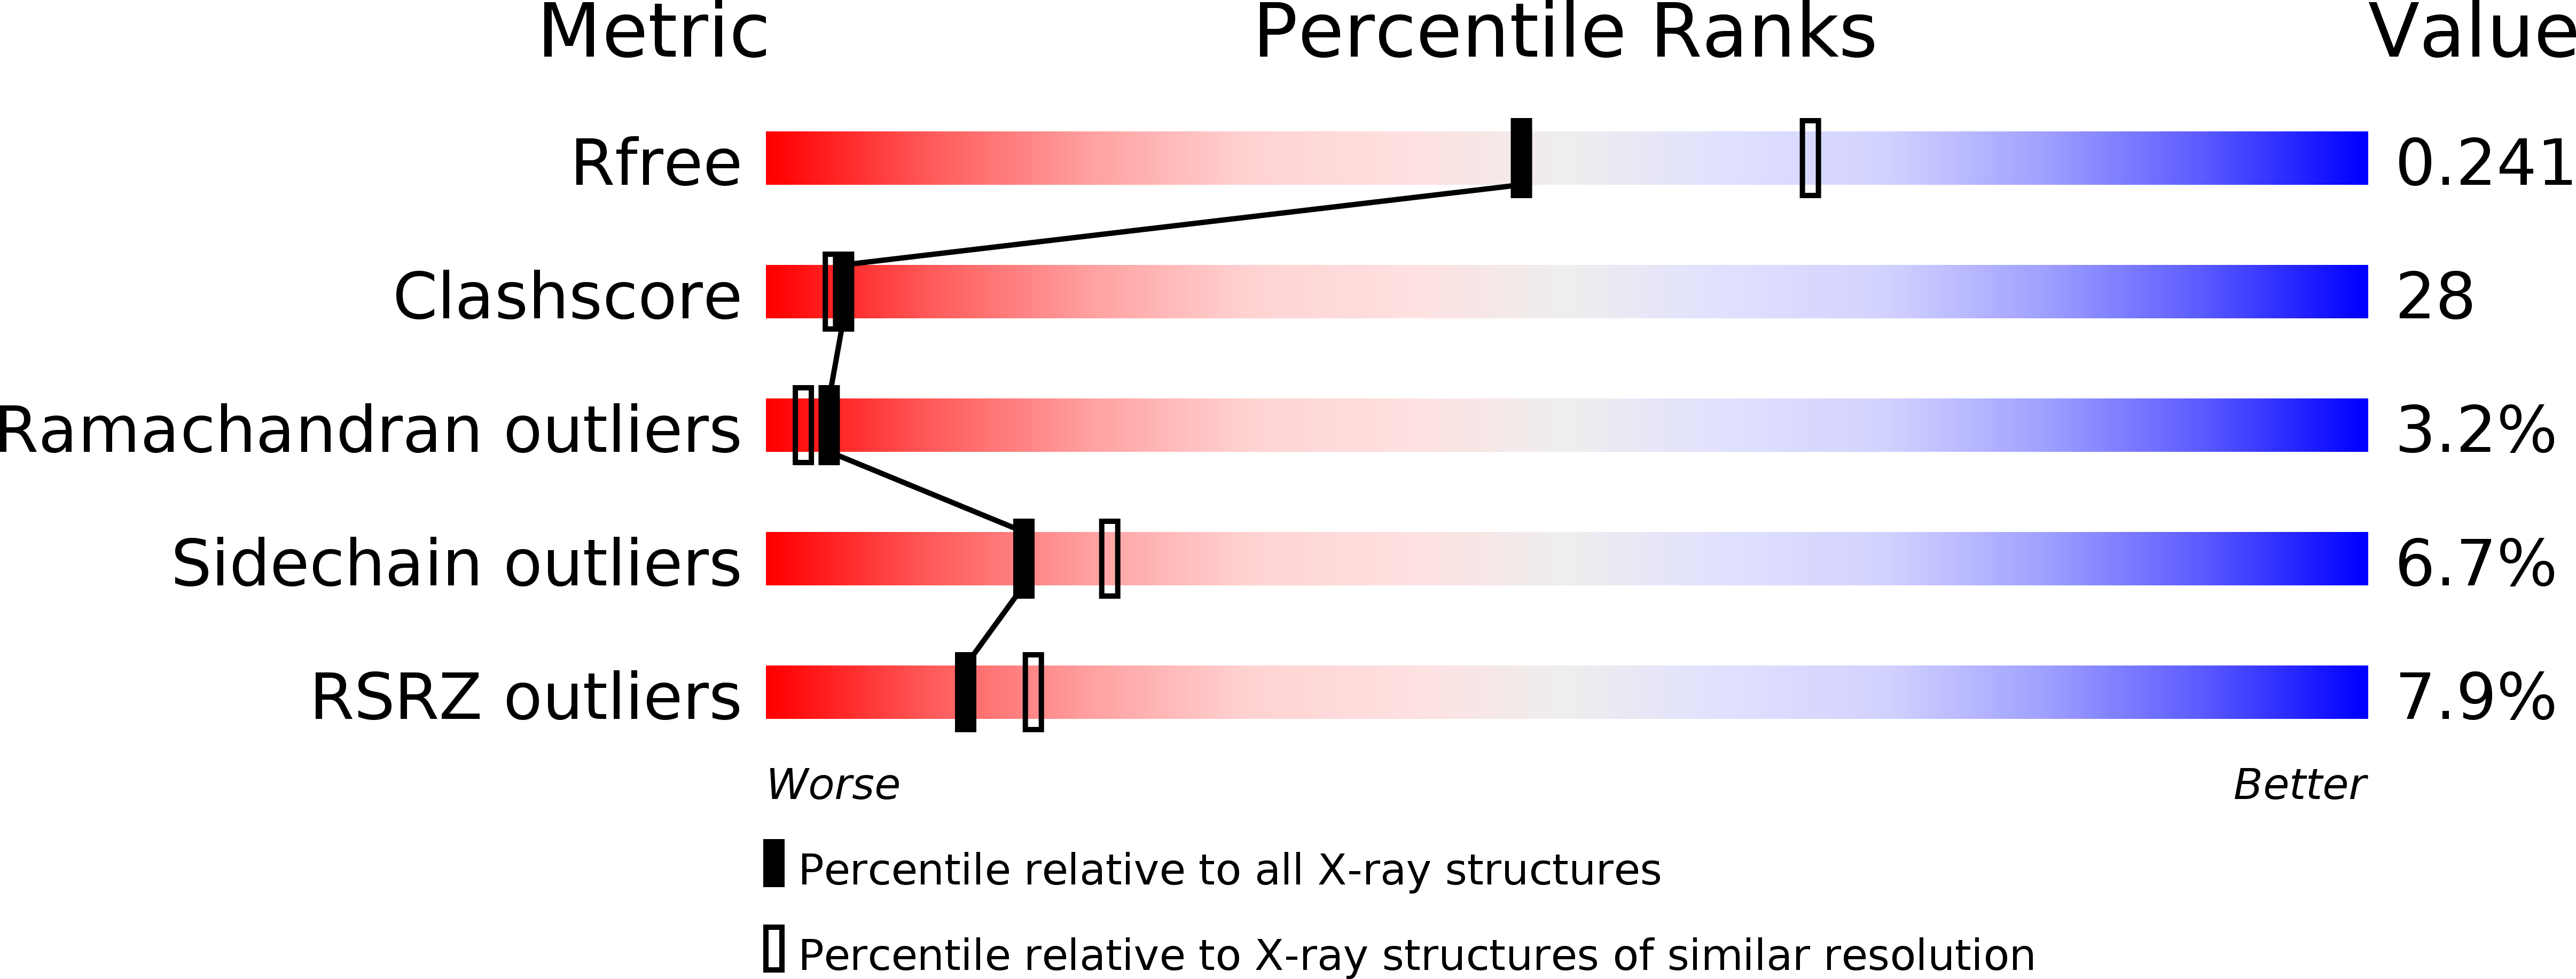 Rcsb Pdb 3plq Crystal Structure Of Pka Type I Regulatory Subunit X Ray Circuit Diagram Validation